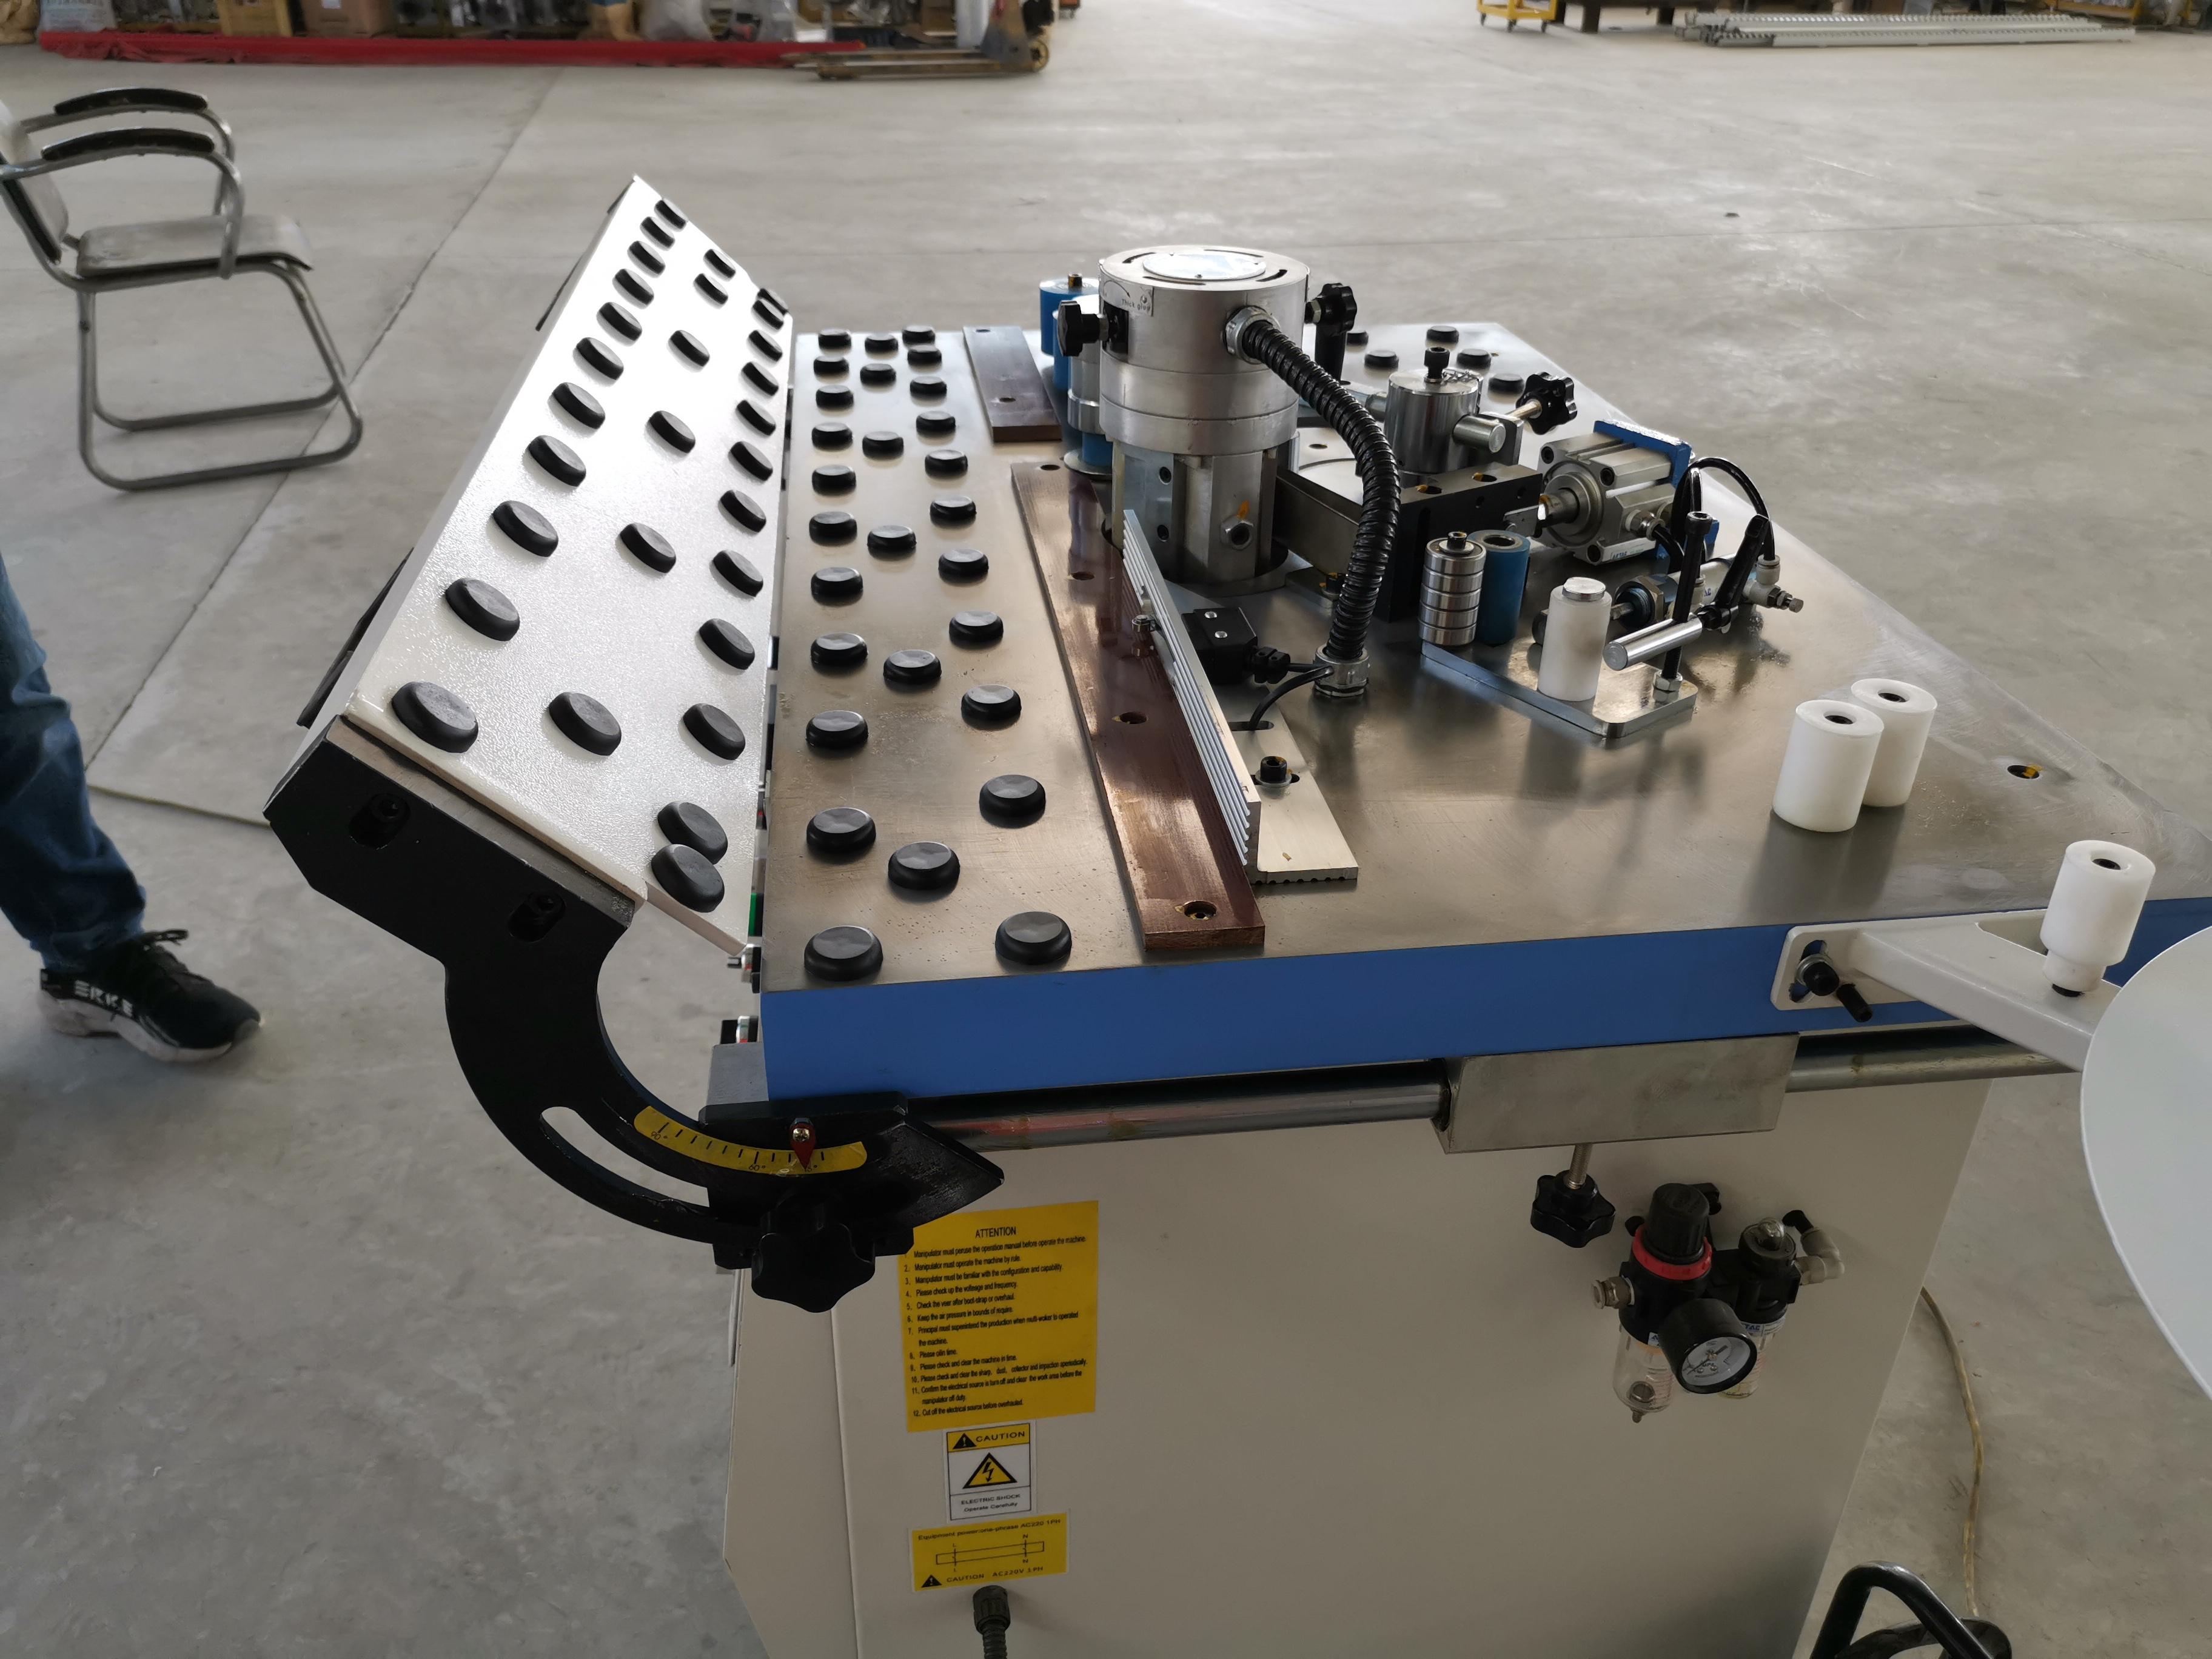 ZICAR MF515A manual edge banding machine with woodworking